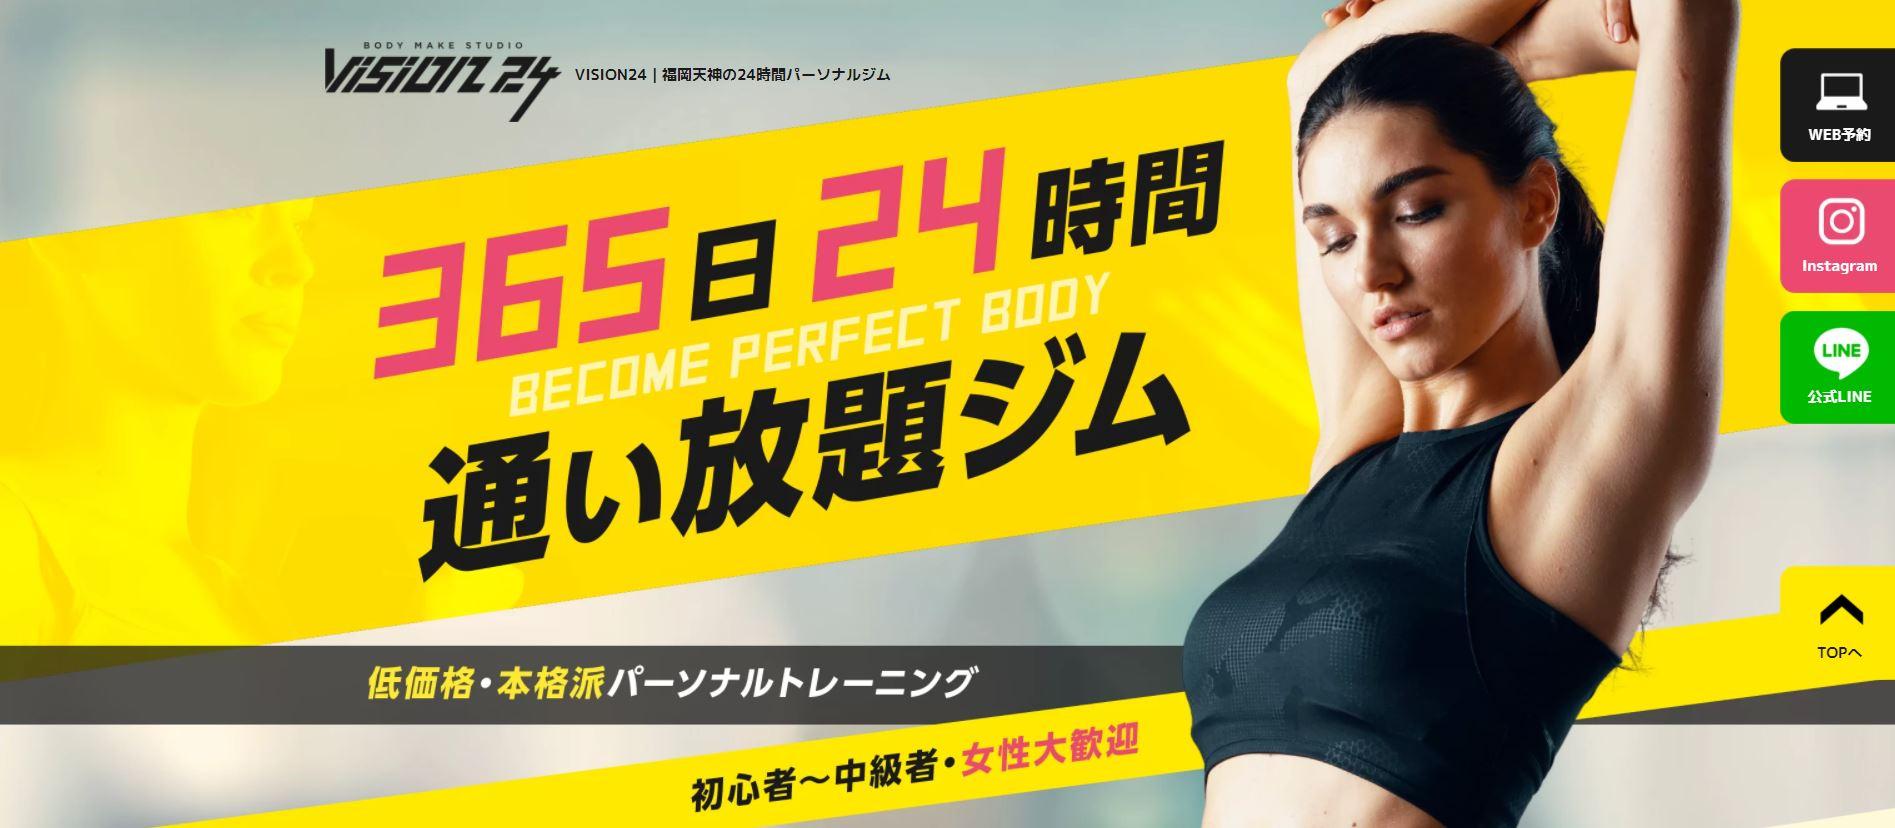 VISION24 (ビジョン24) 福岡天神店